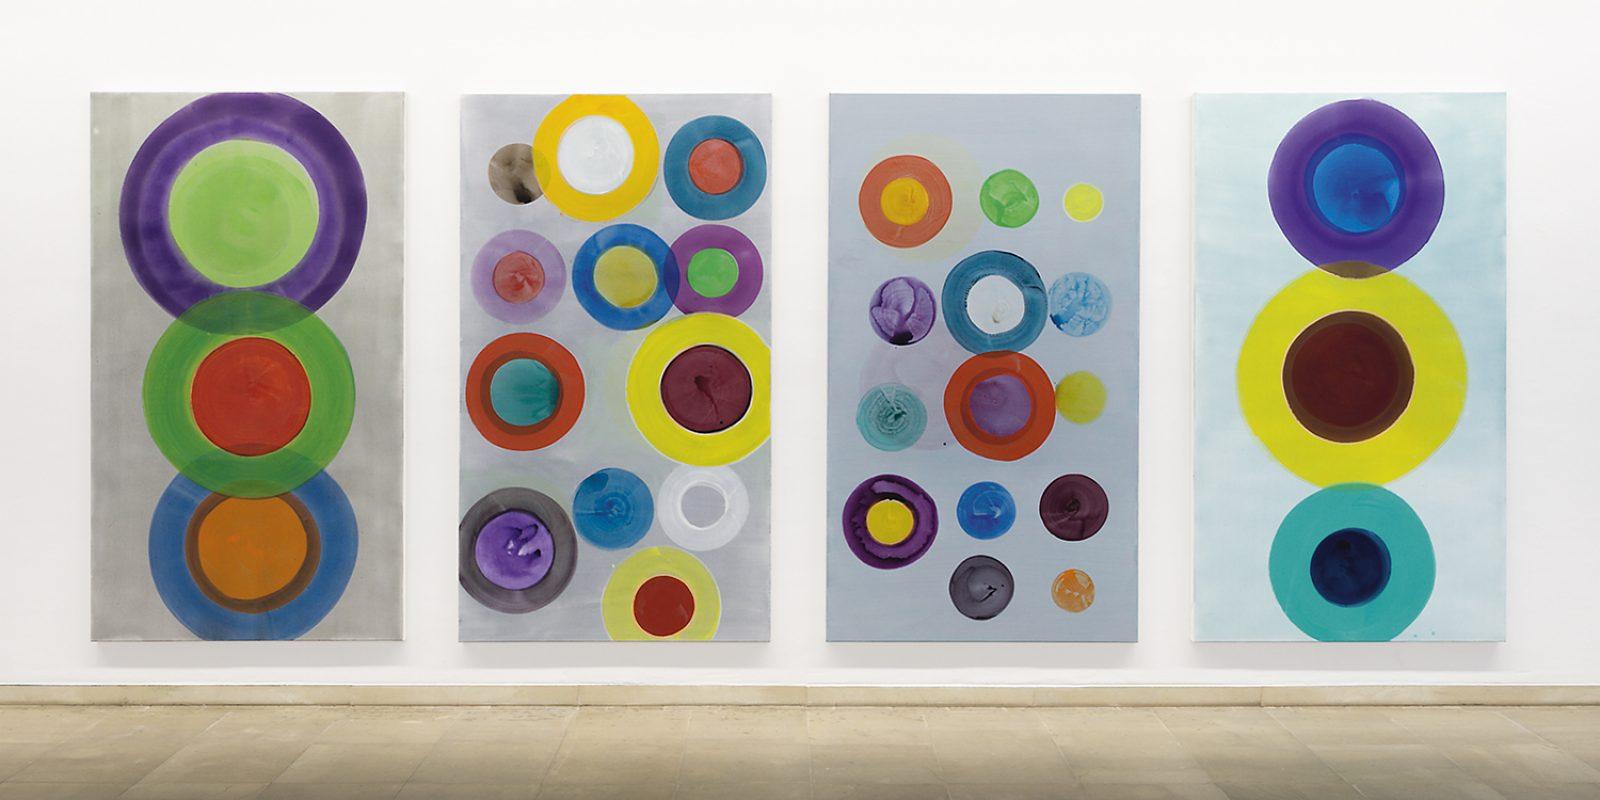 Hans-Willi Notthoff – CASINO – je 240x137 cm, Acryl auf Leinwand, 2013, Installation Kunstmuseum Solingen, 2013